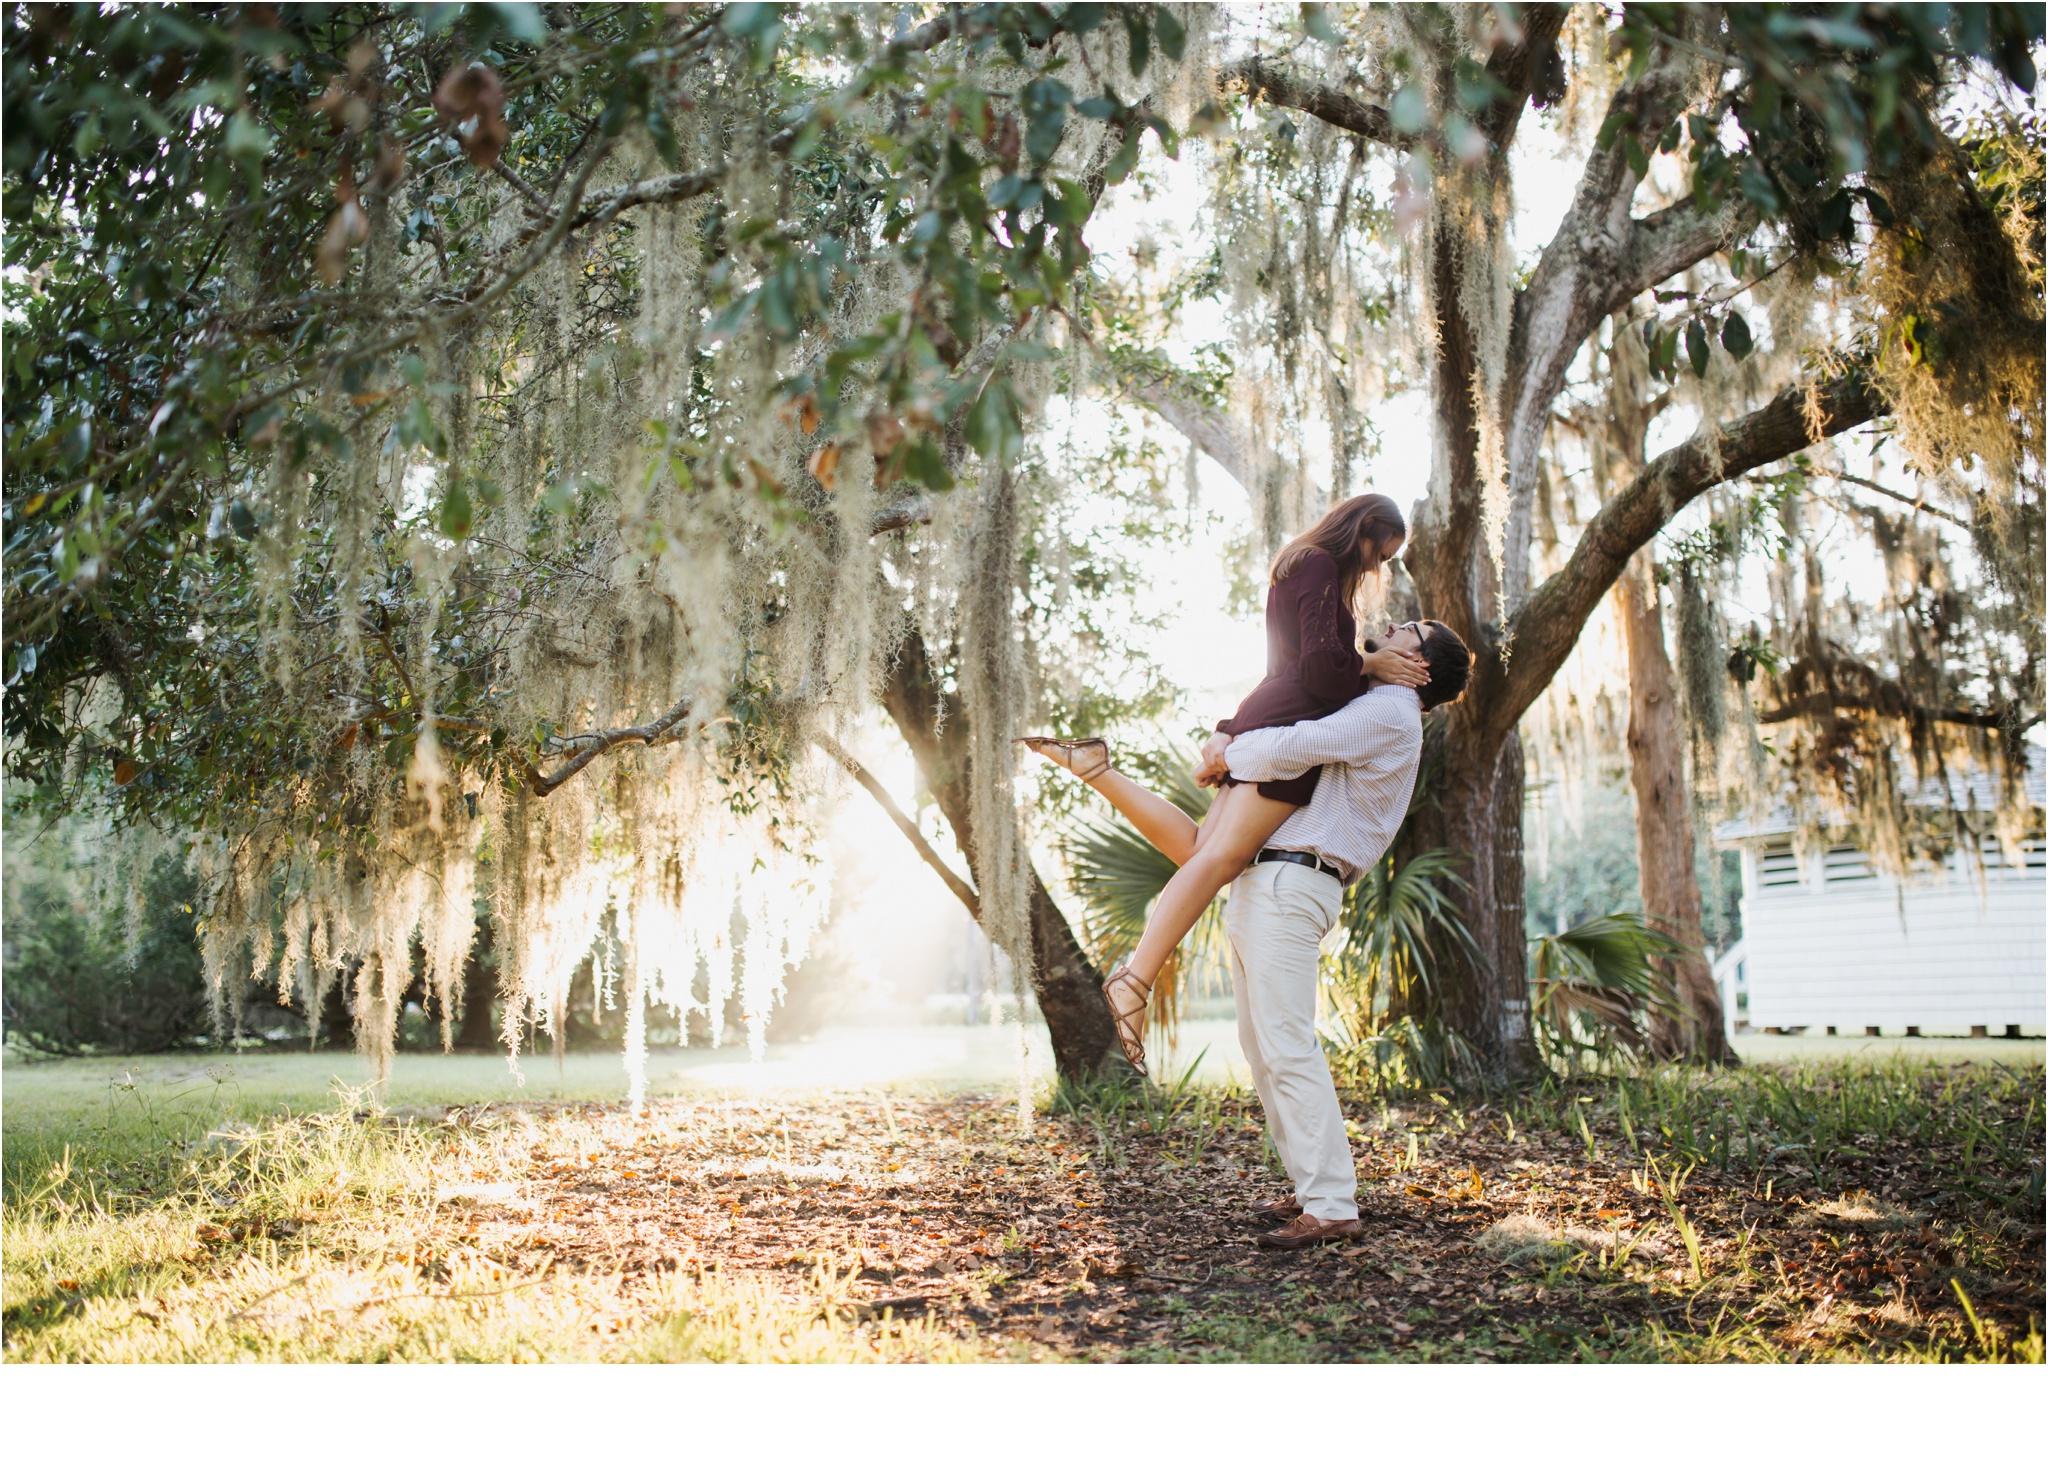 Rainey_Gregg_Photography_St._Simons_Island_Georgia_California_Wedding_Portrait_Photography_1380.jpg